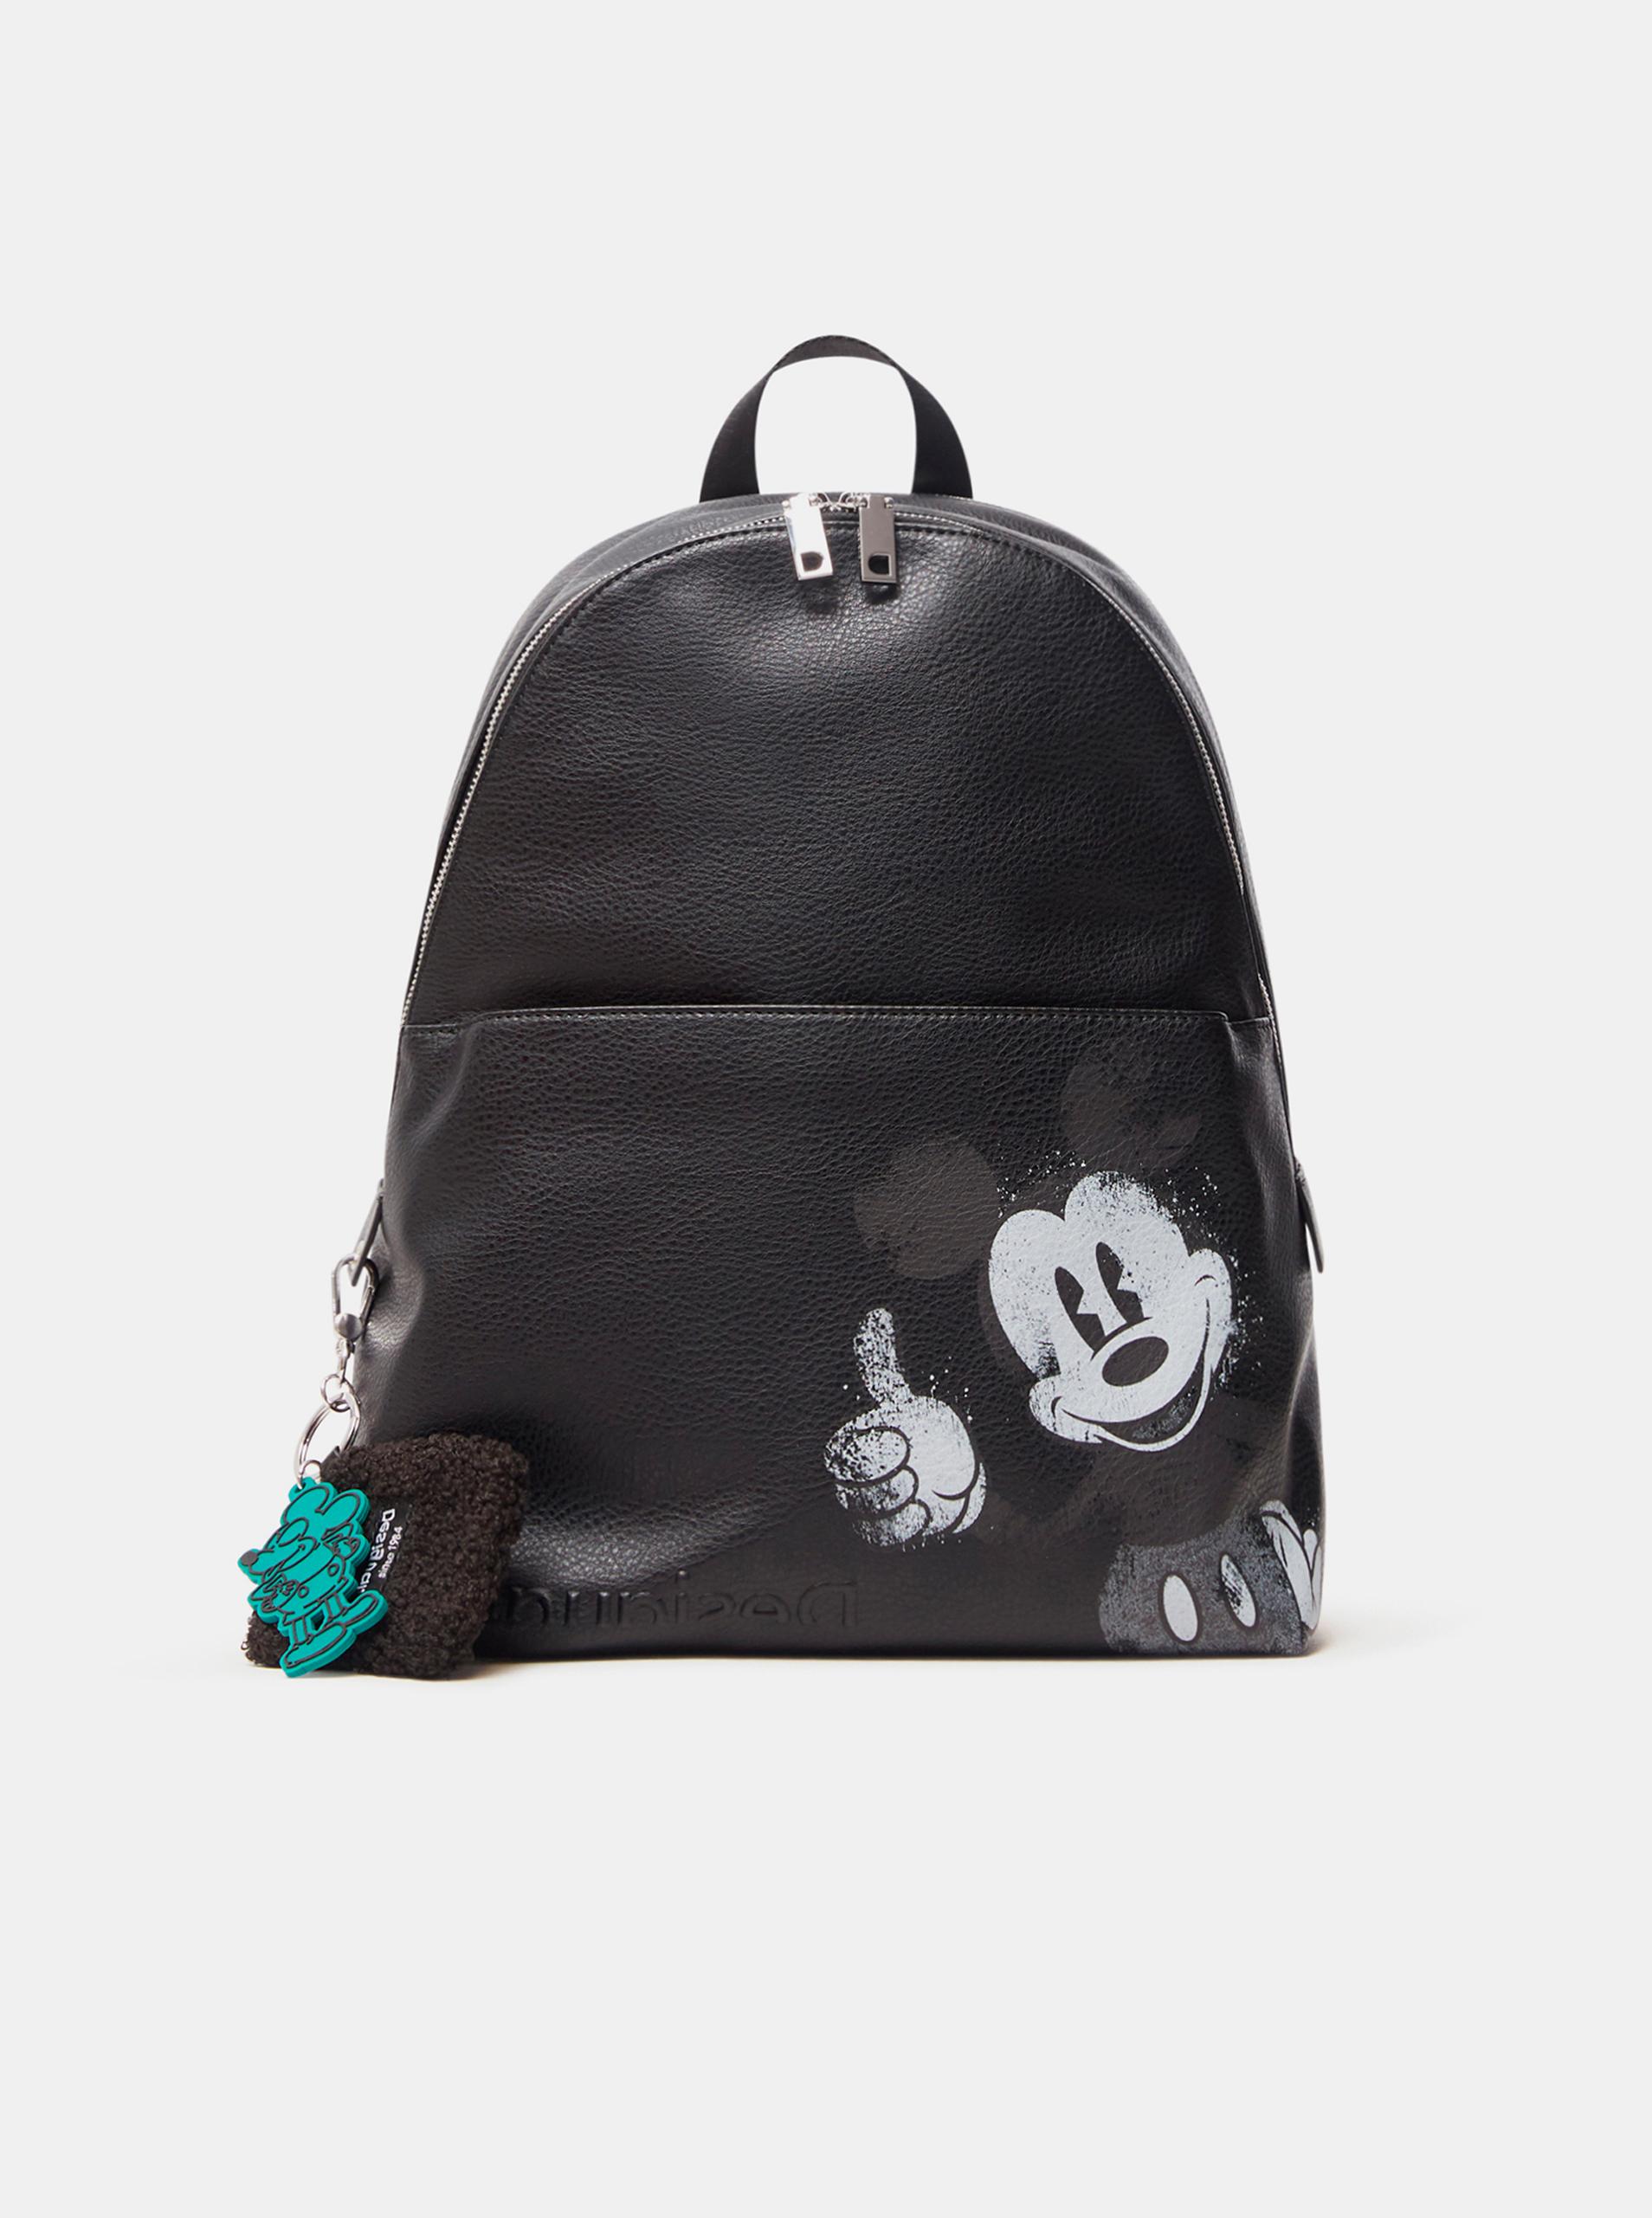 Desigual Rucsac de dama negru  Mickey